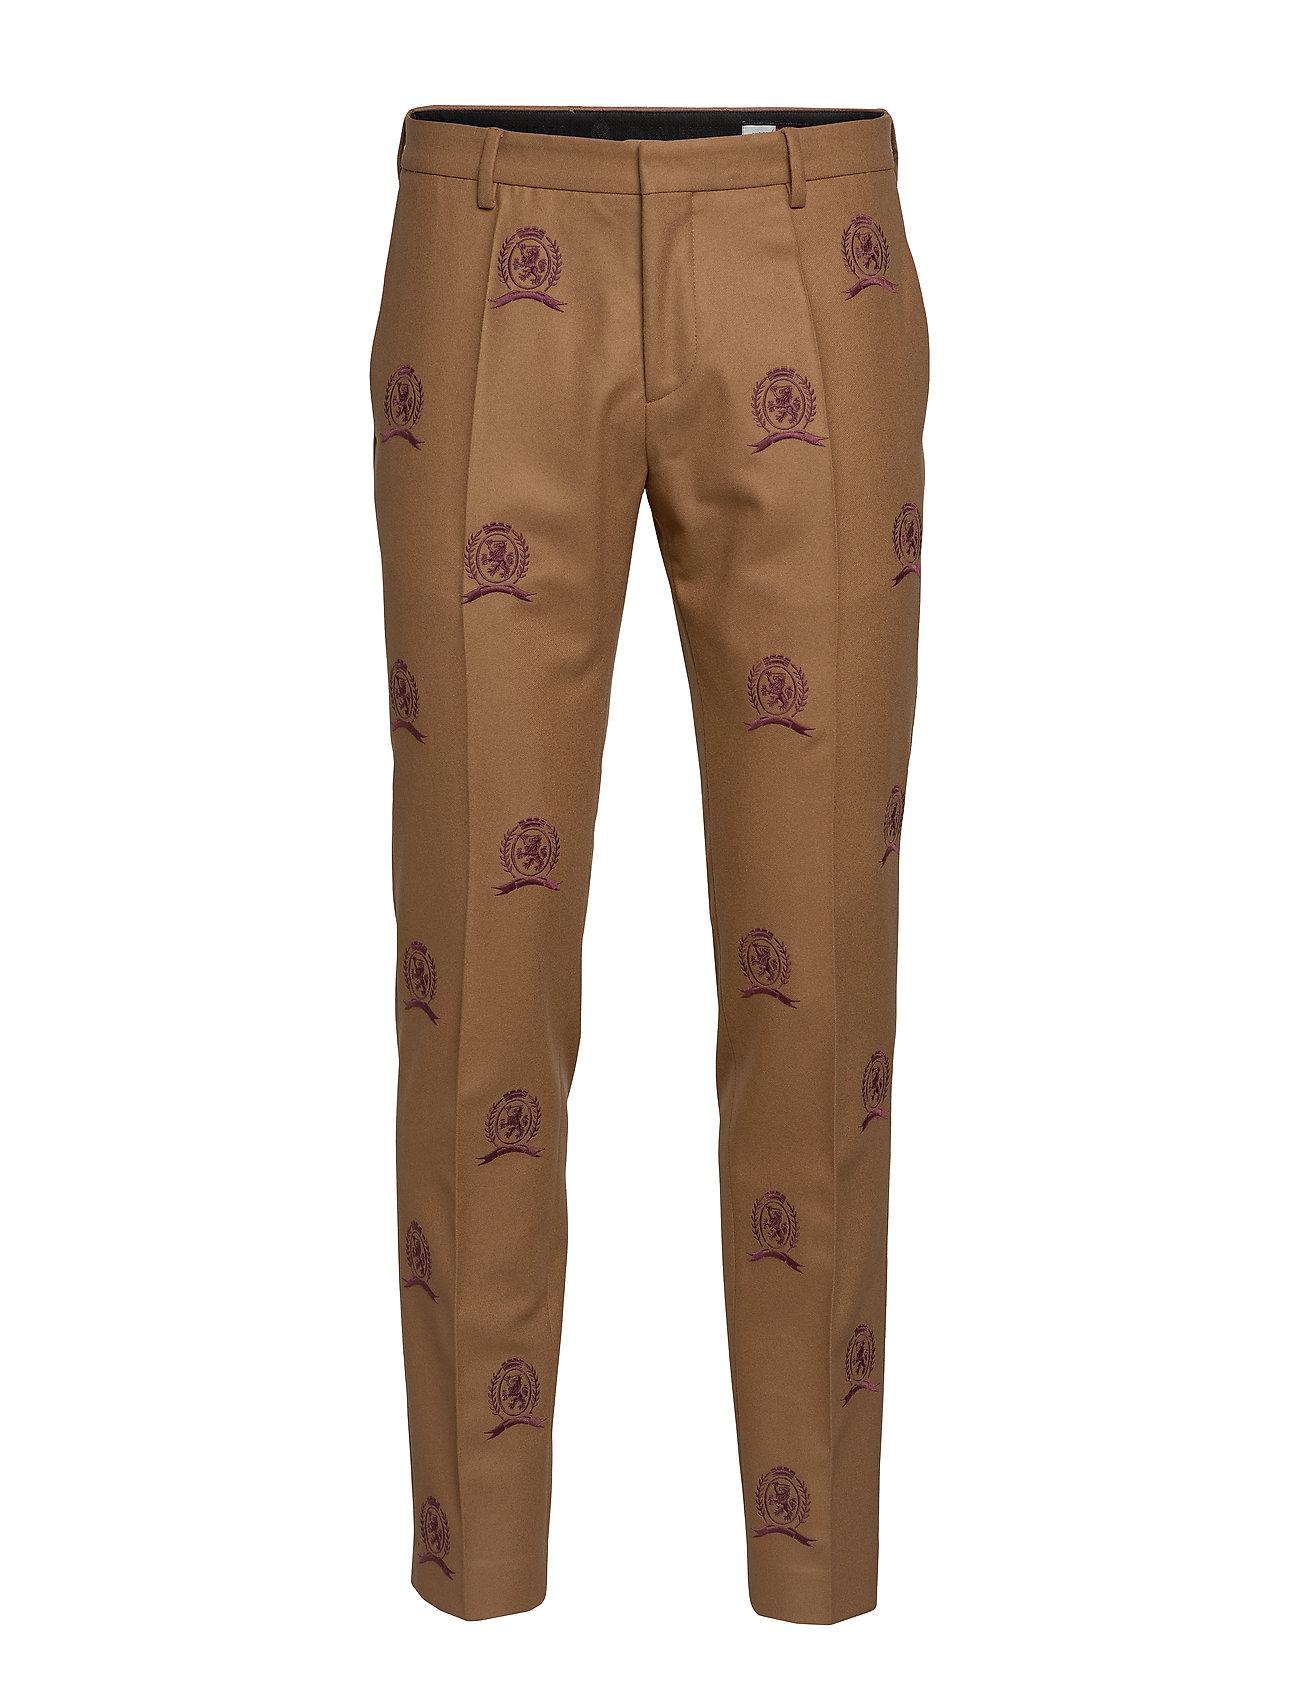 Image of Hcm Suit Sep Pants Embroidery Habitbukser Stylede Bukser Beige Hilfiger Collection (3236598909)